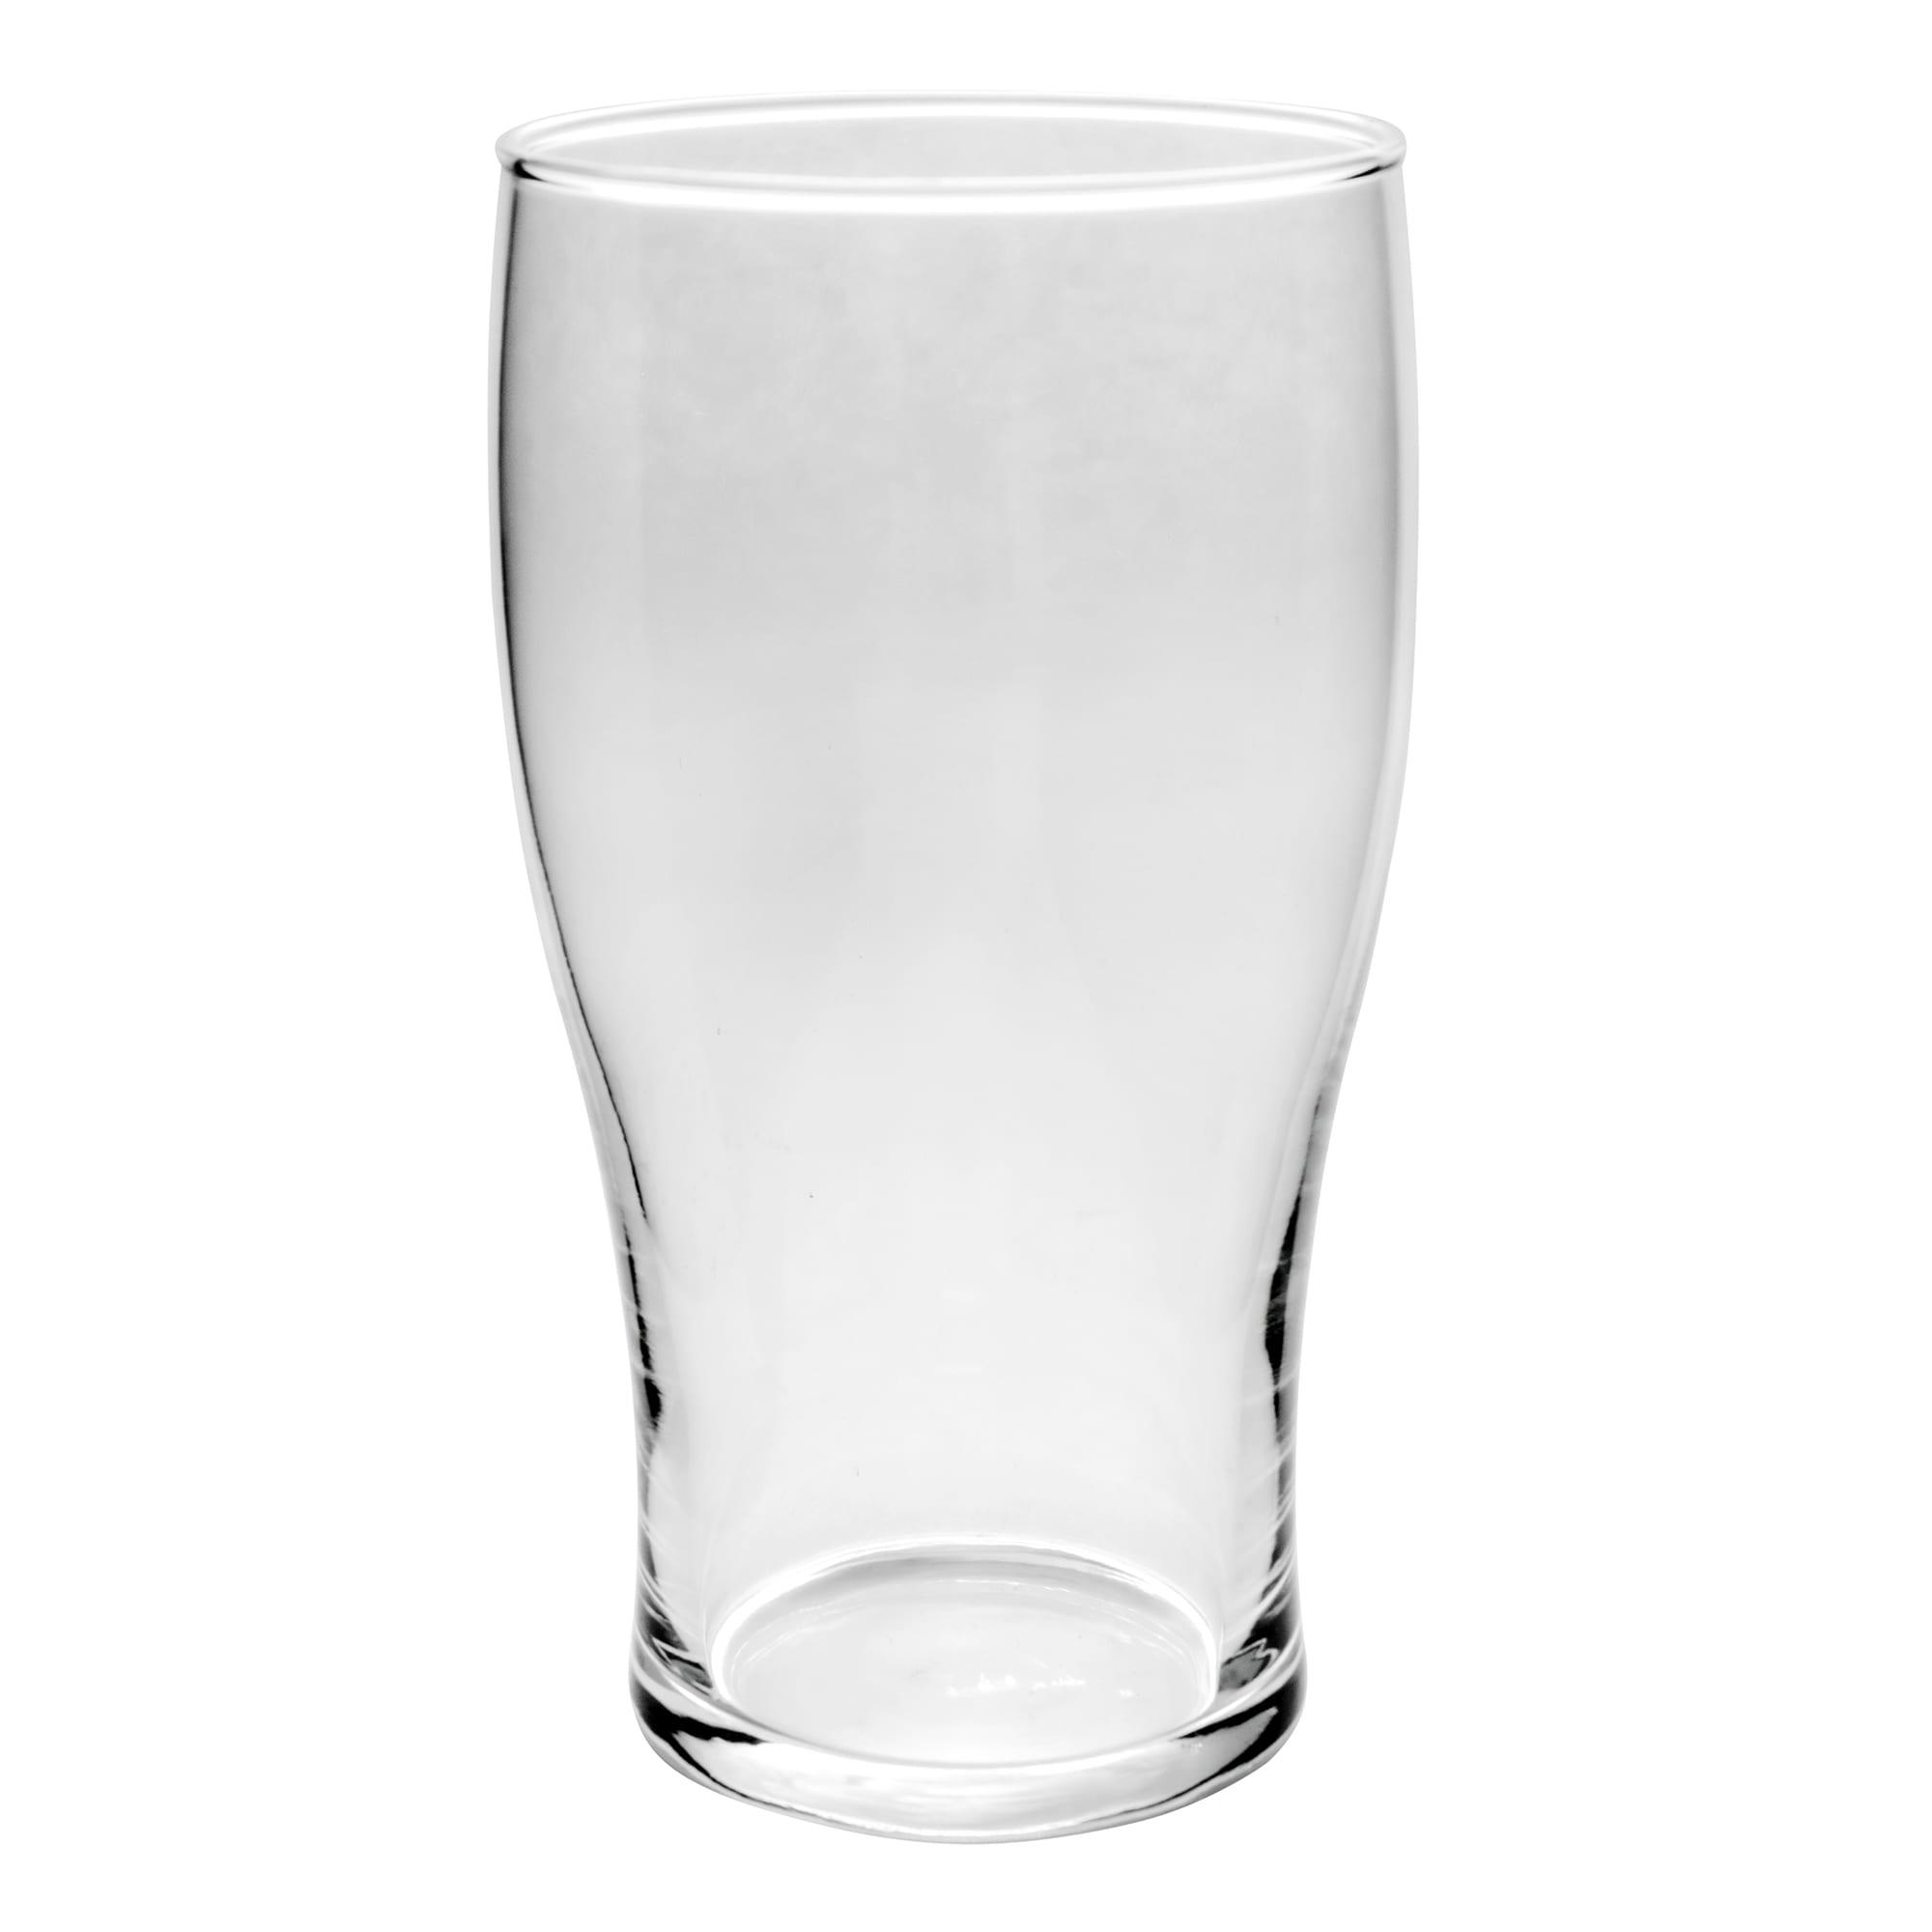 Libbey 4803 20 oz Pub Glass - Safedge Rim Guarantee